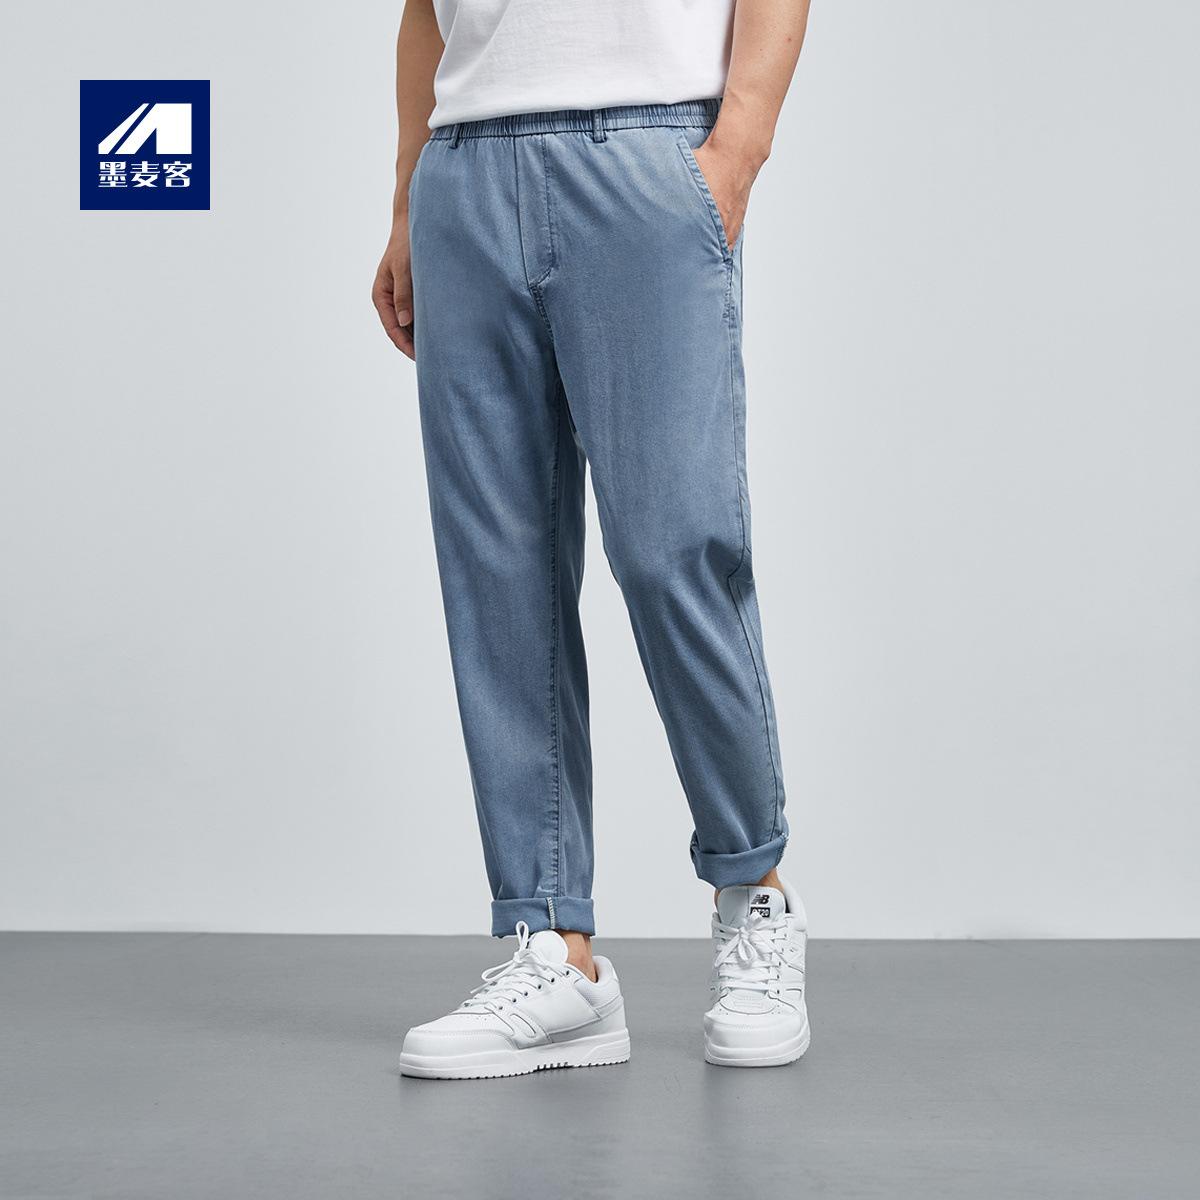 Momic men's 2021 summer new simple men's jeans Tencel elastic mid-waist pants men